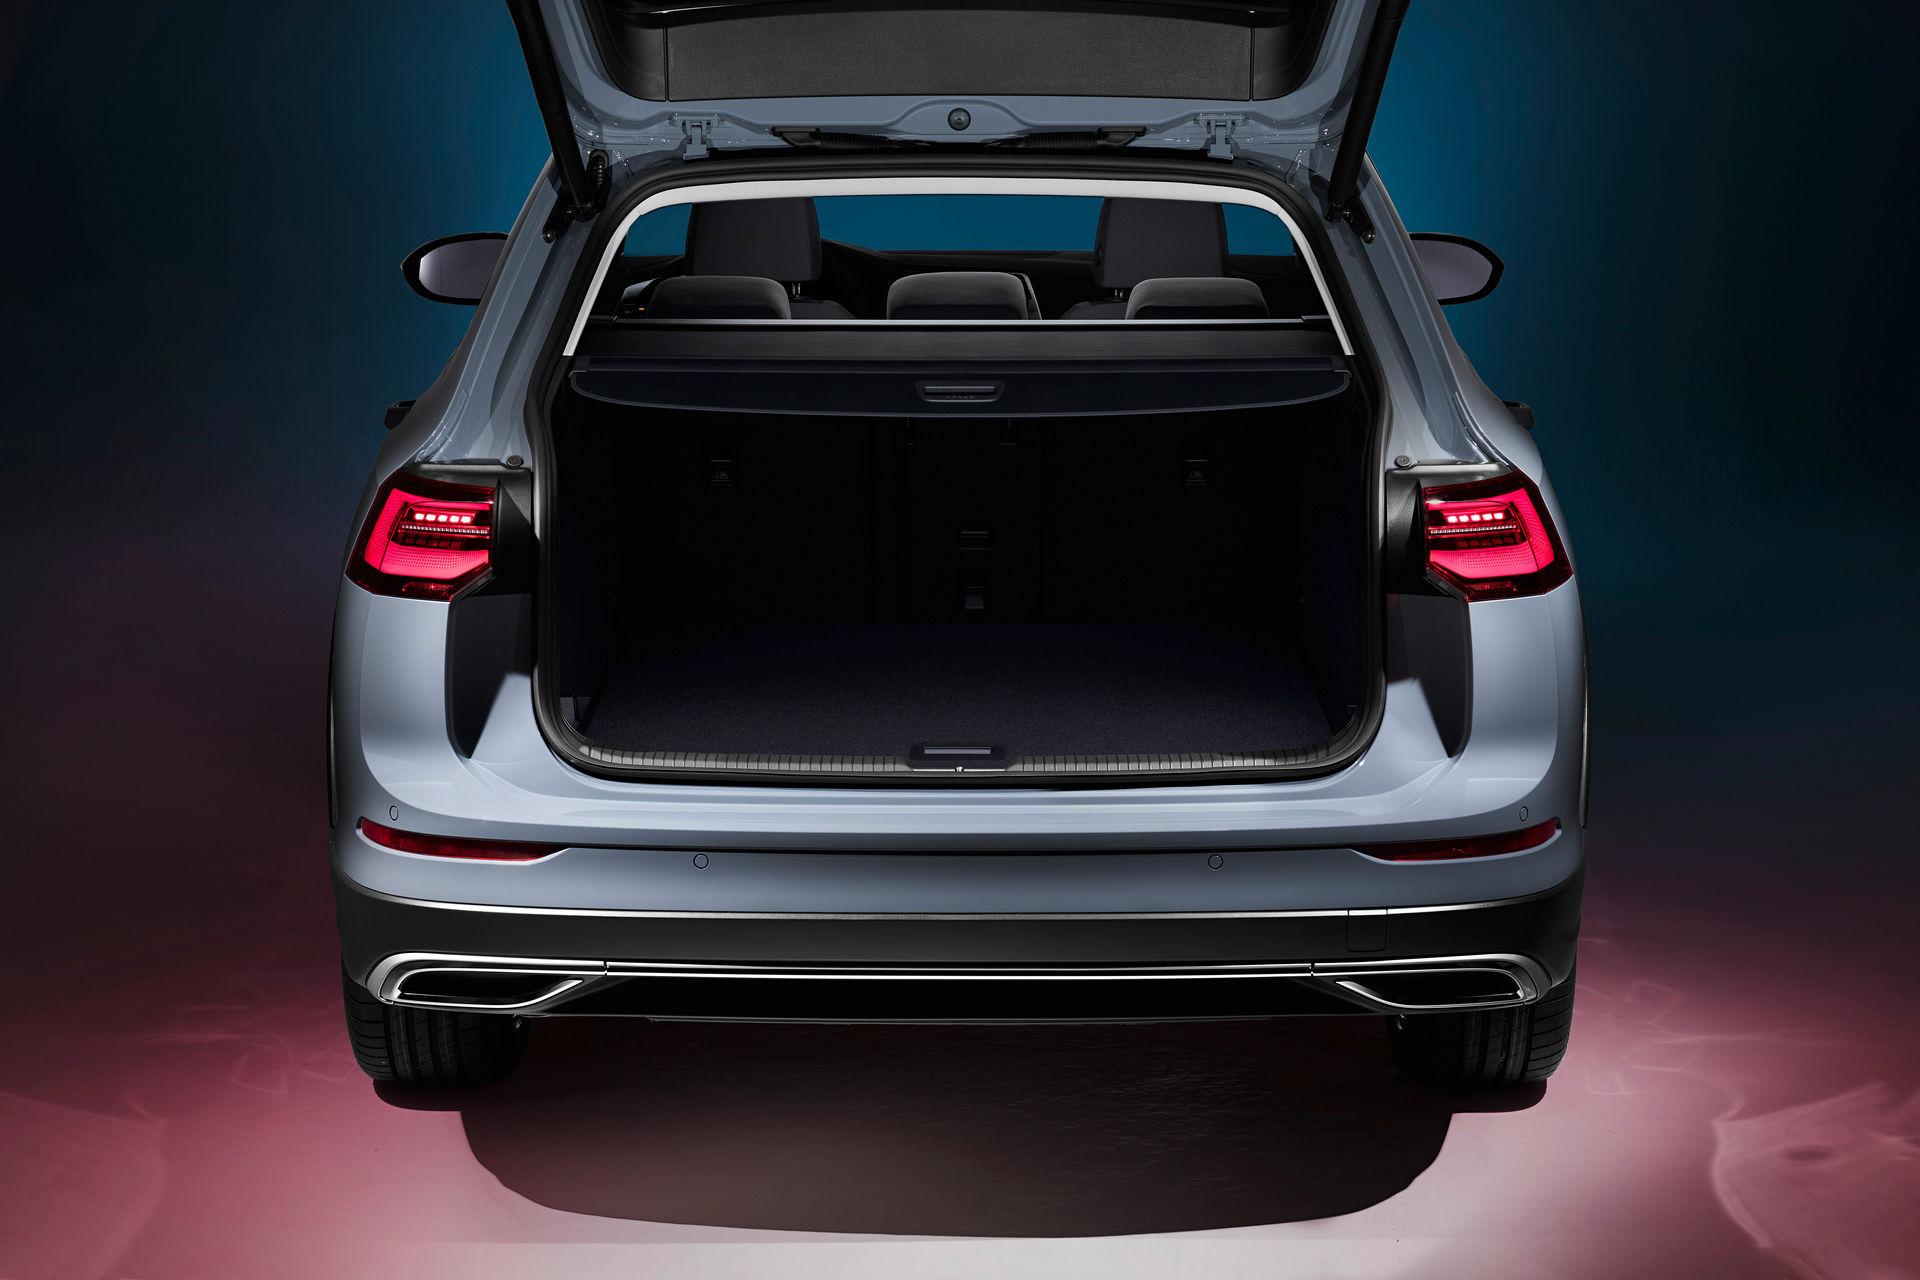 VW-Golf-Estate-And-Golf-Alltrack-13